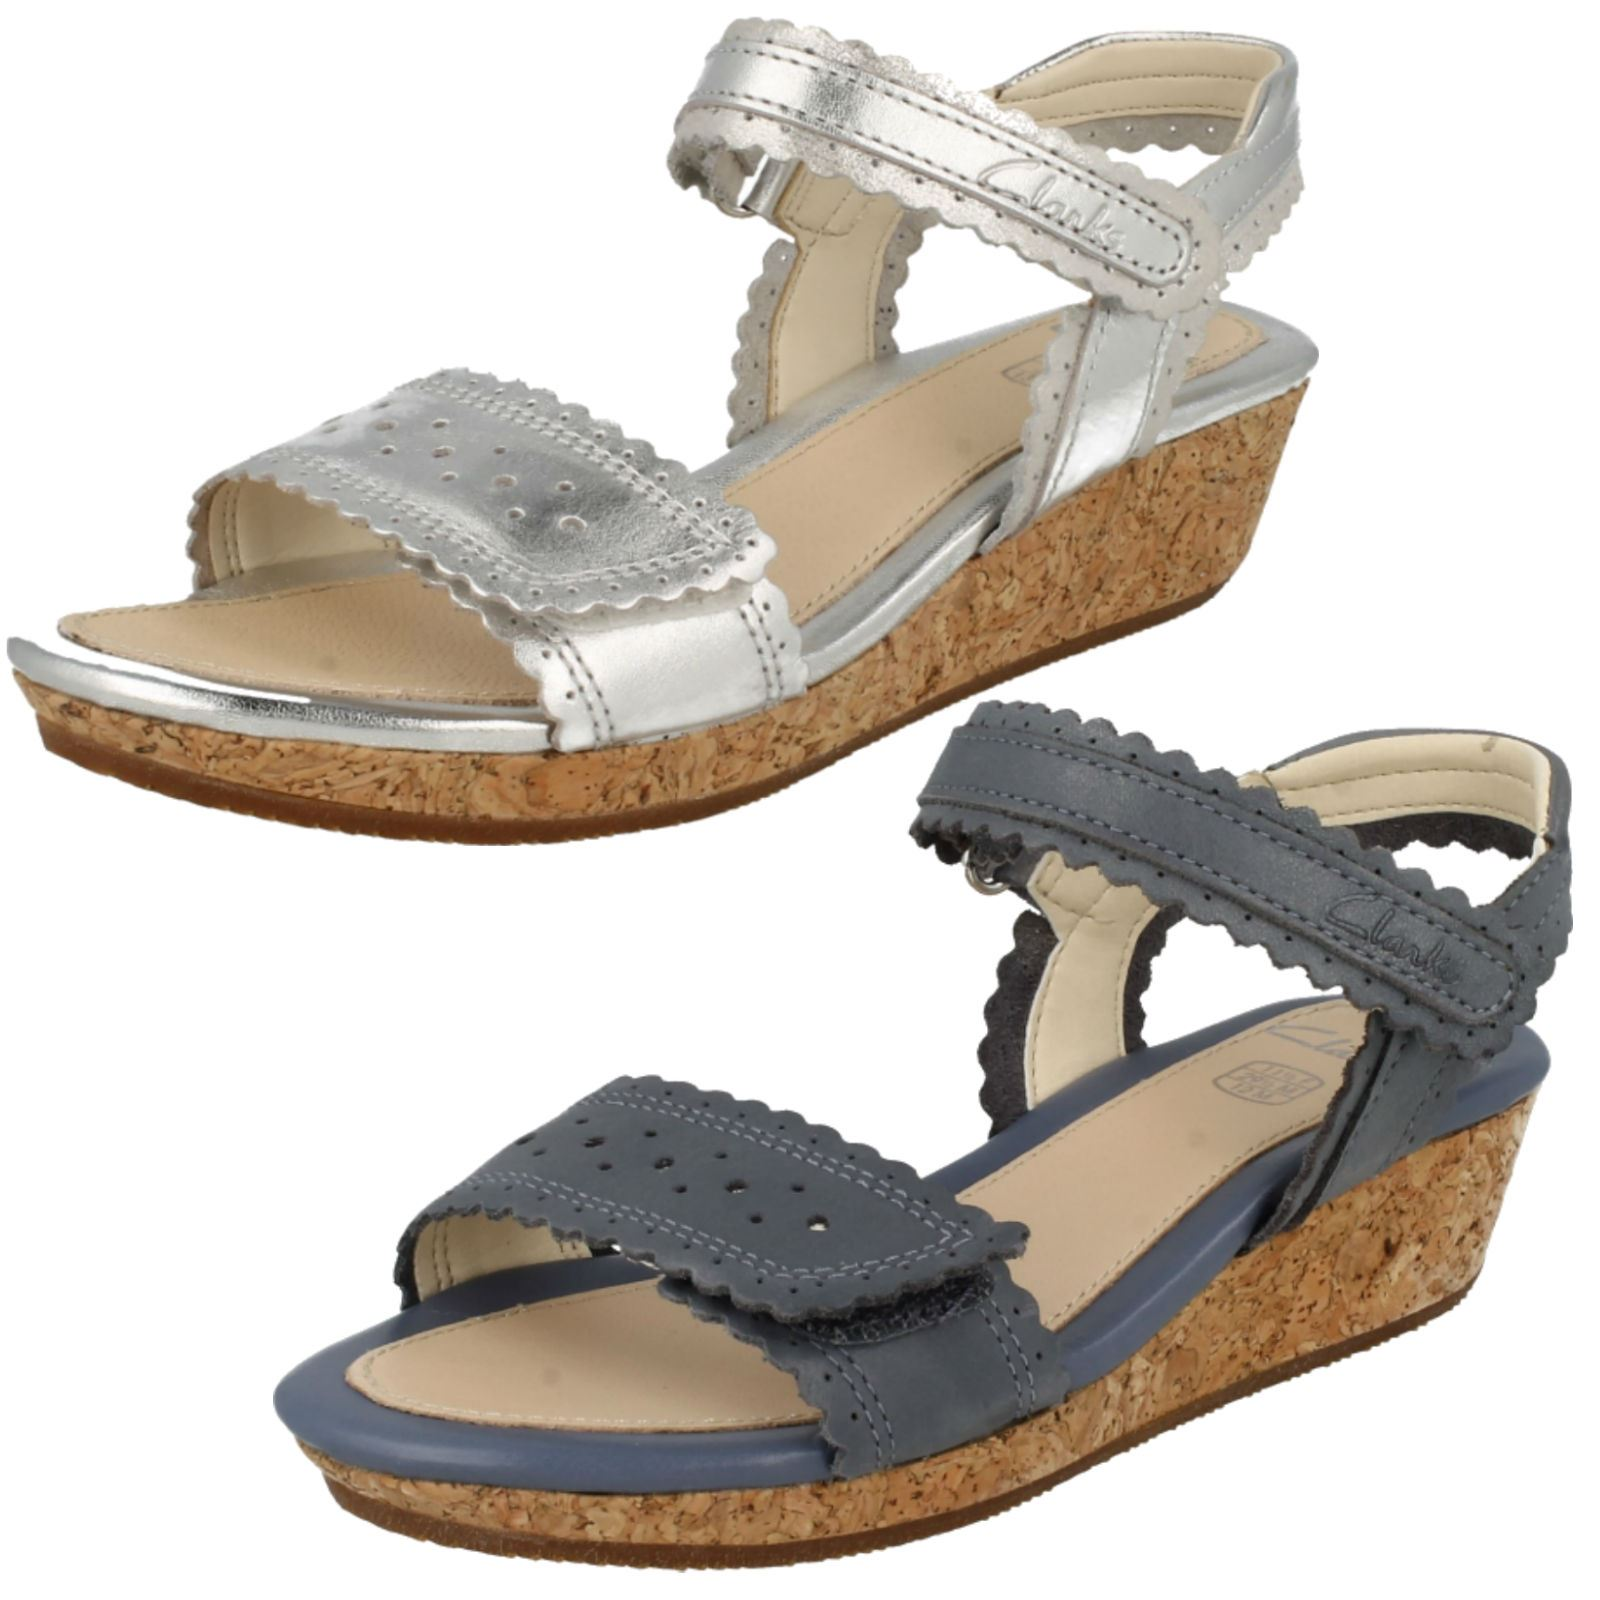 Details about Girls Clarks Wedge Heel Summer Sandals Harpy Myth